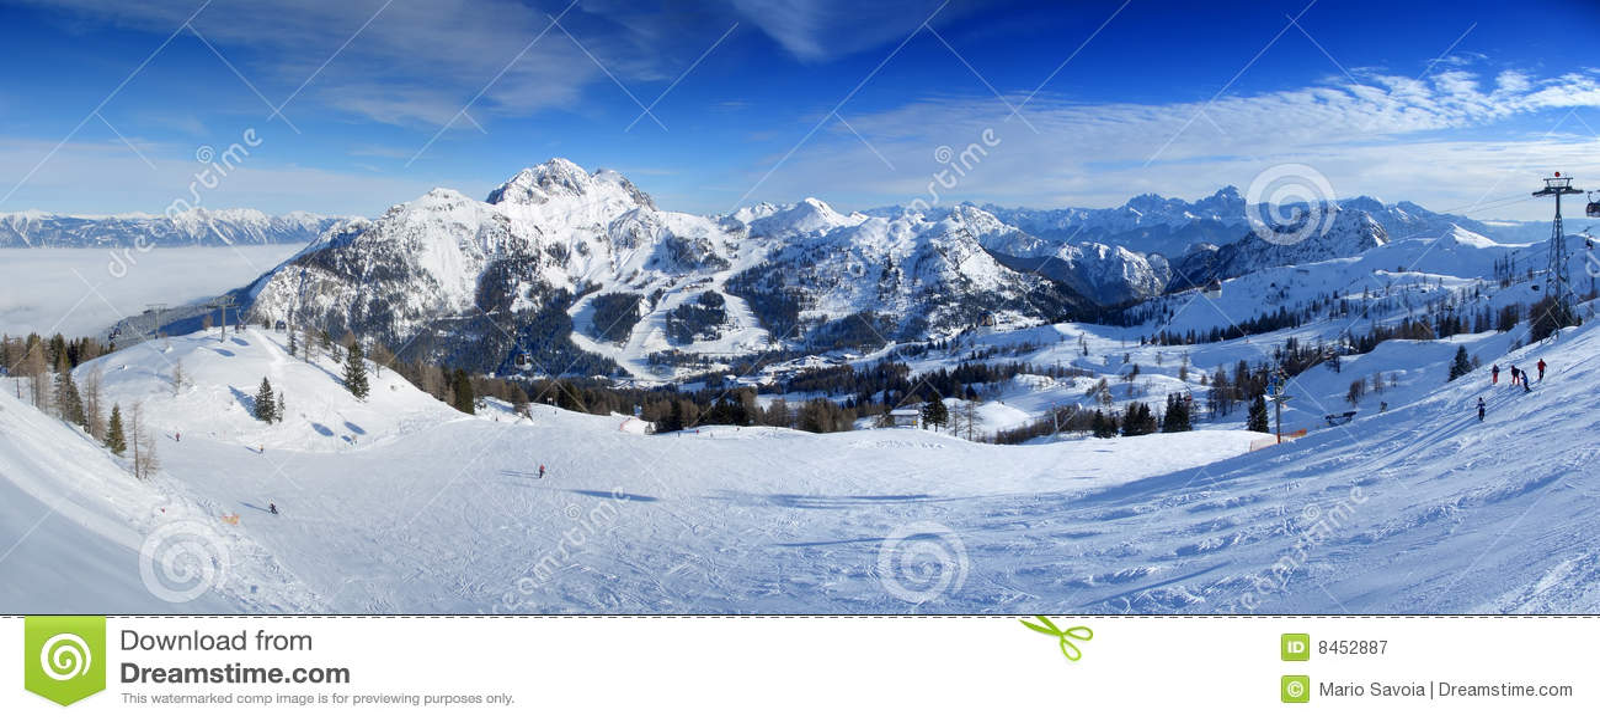 Panoramasemesterorten skidar